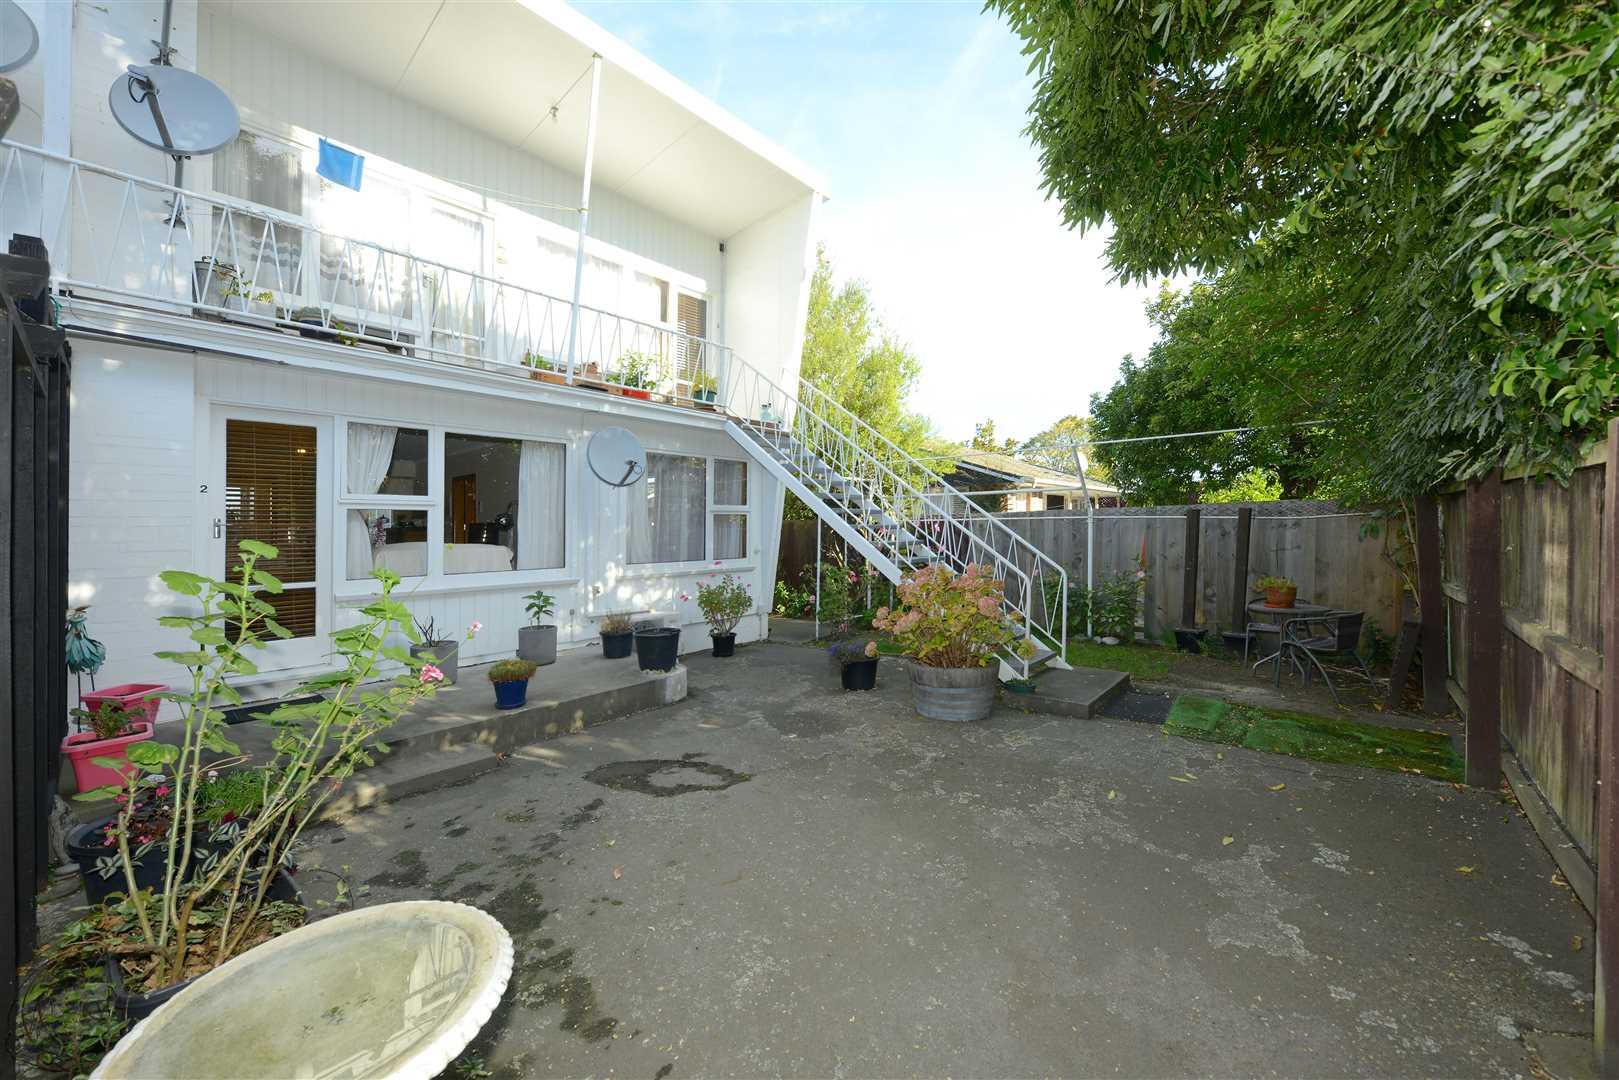 2&3/23 Donald Place, Merivale - Christchurch City